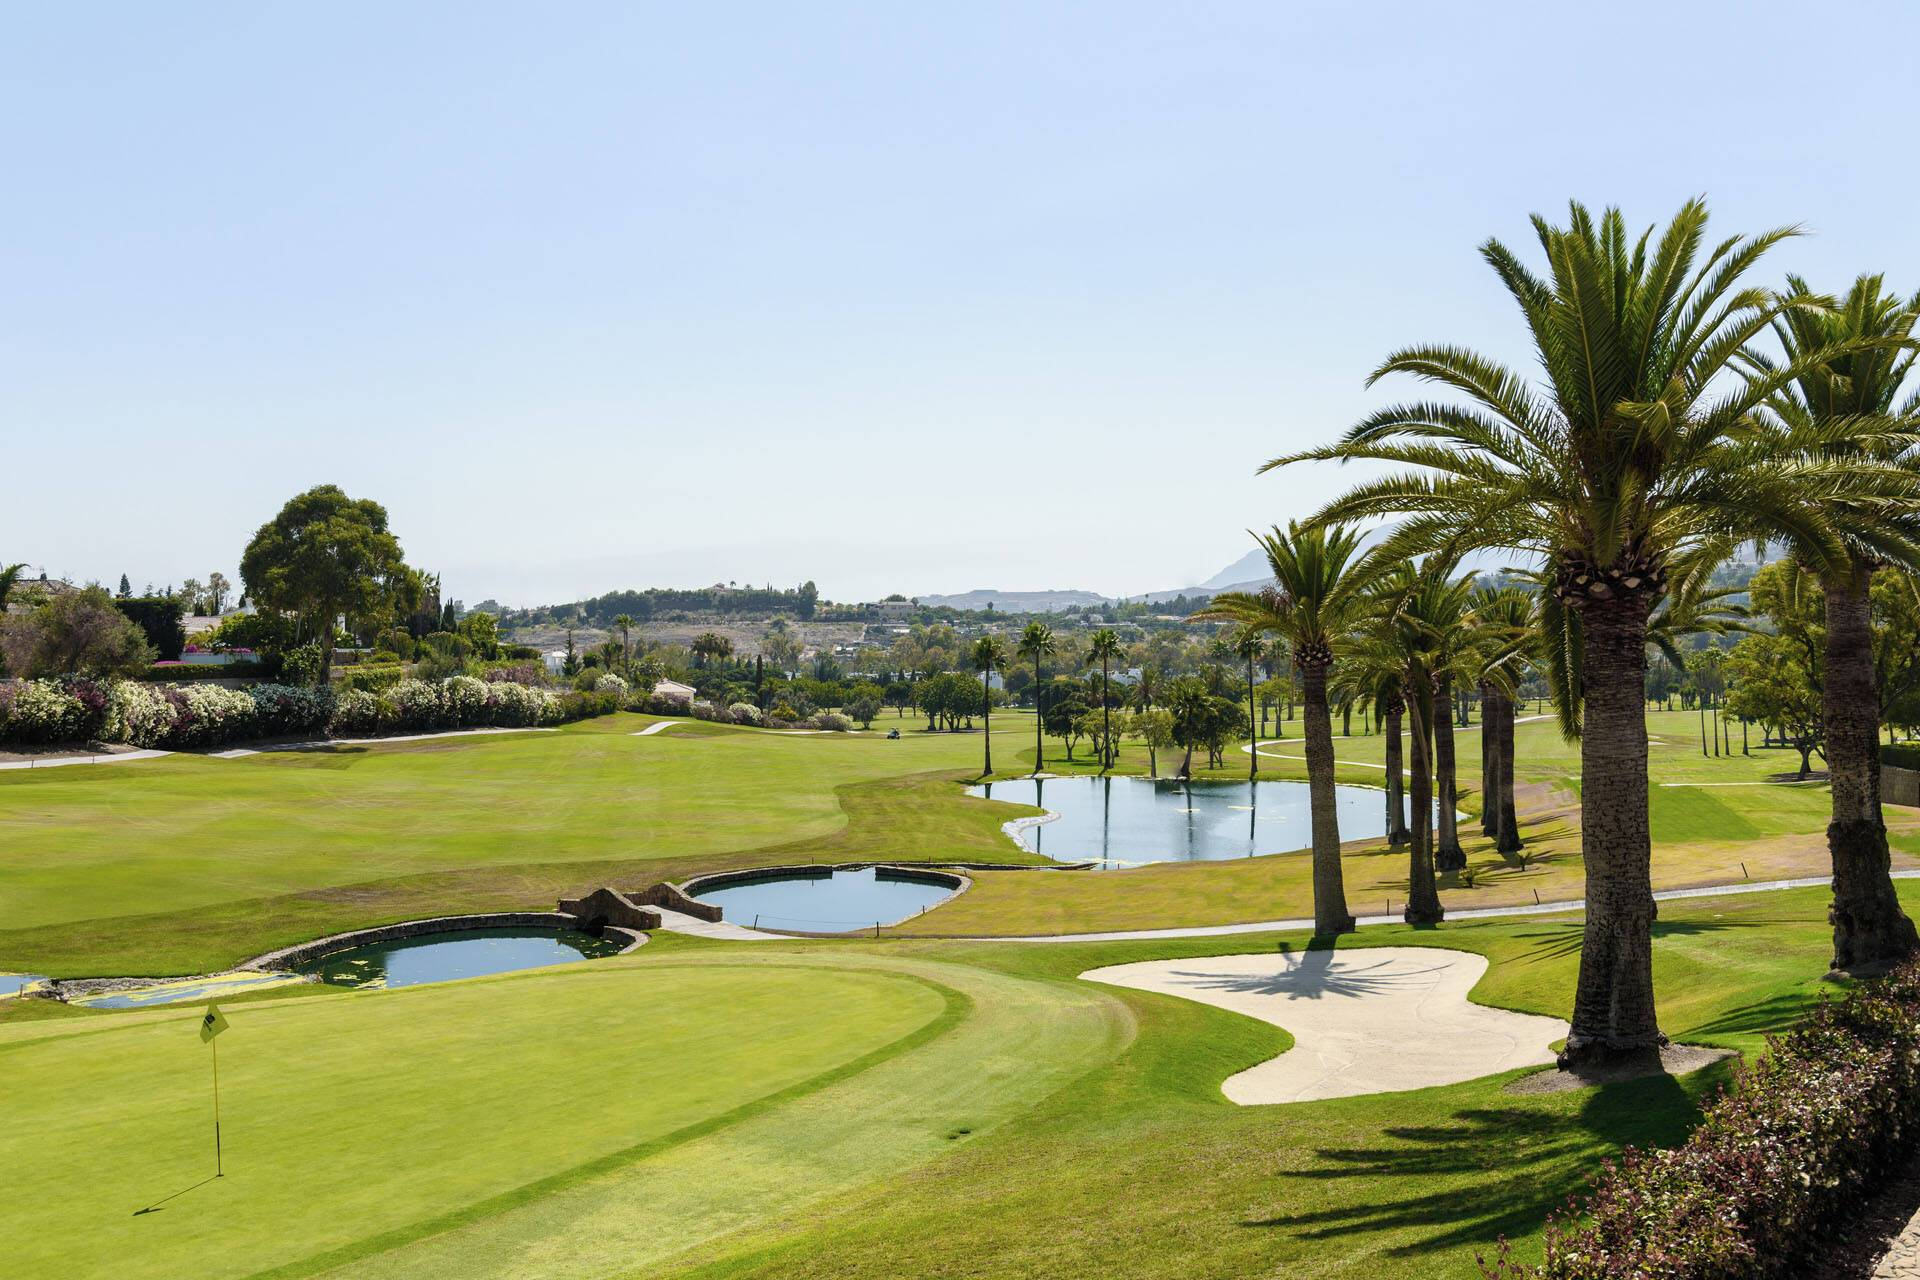 Ikos Andalusia Espagne Golf Course